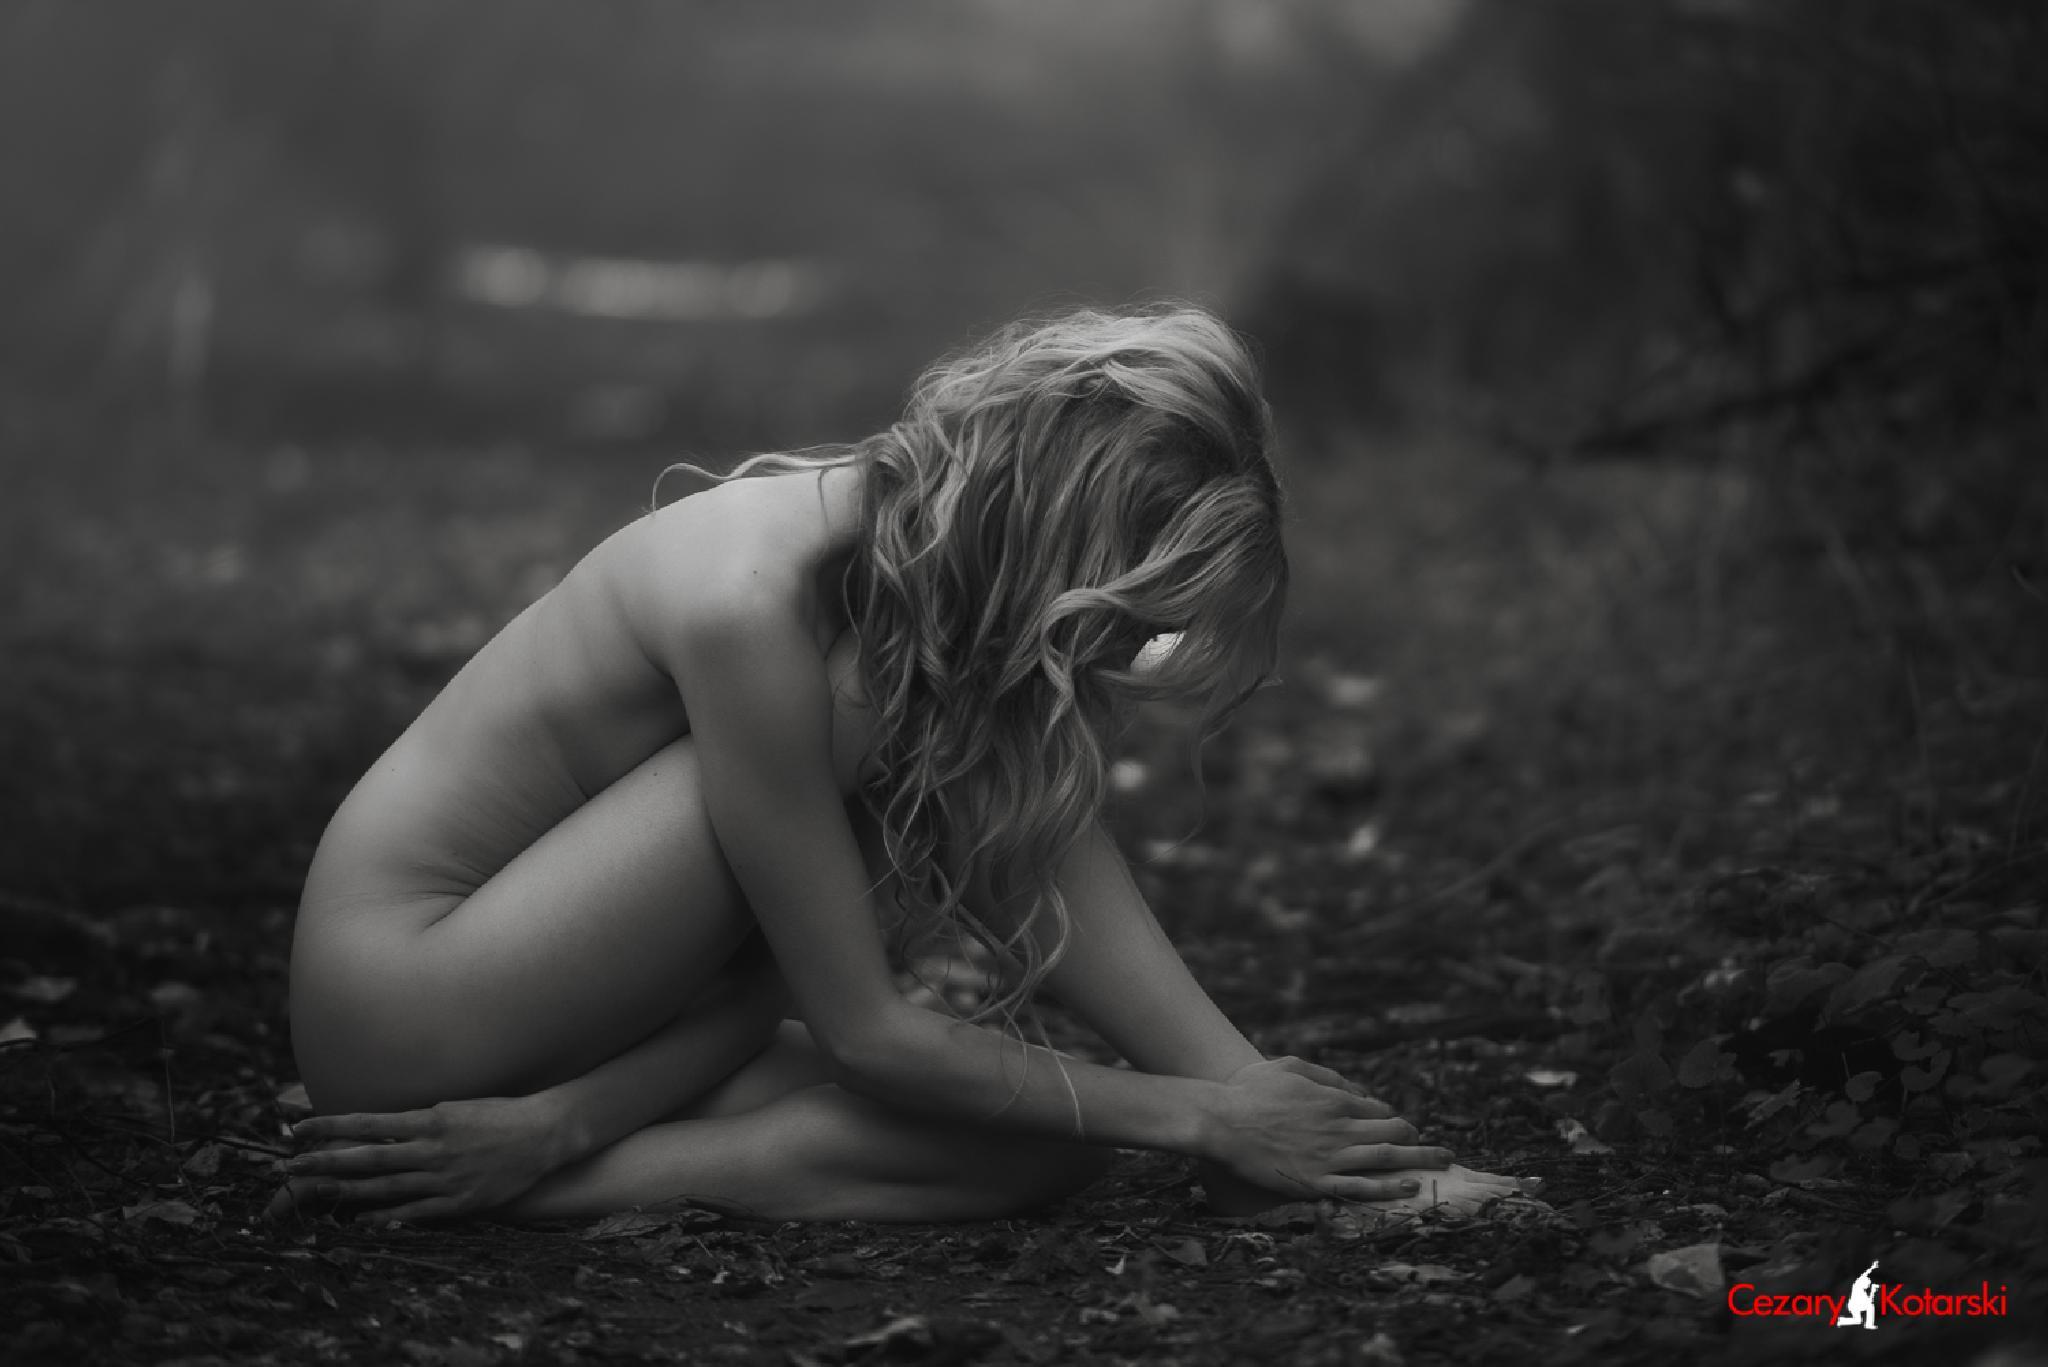 Silence 1 by Cezary Kotarski